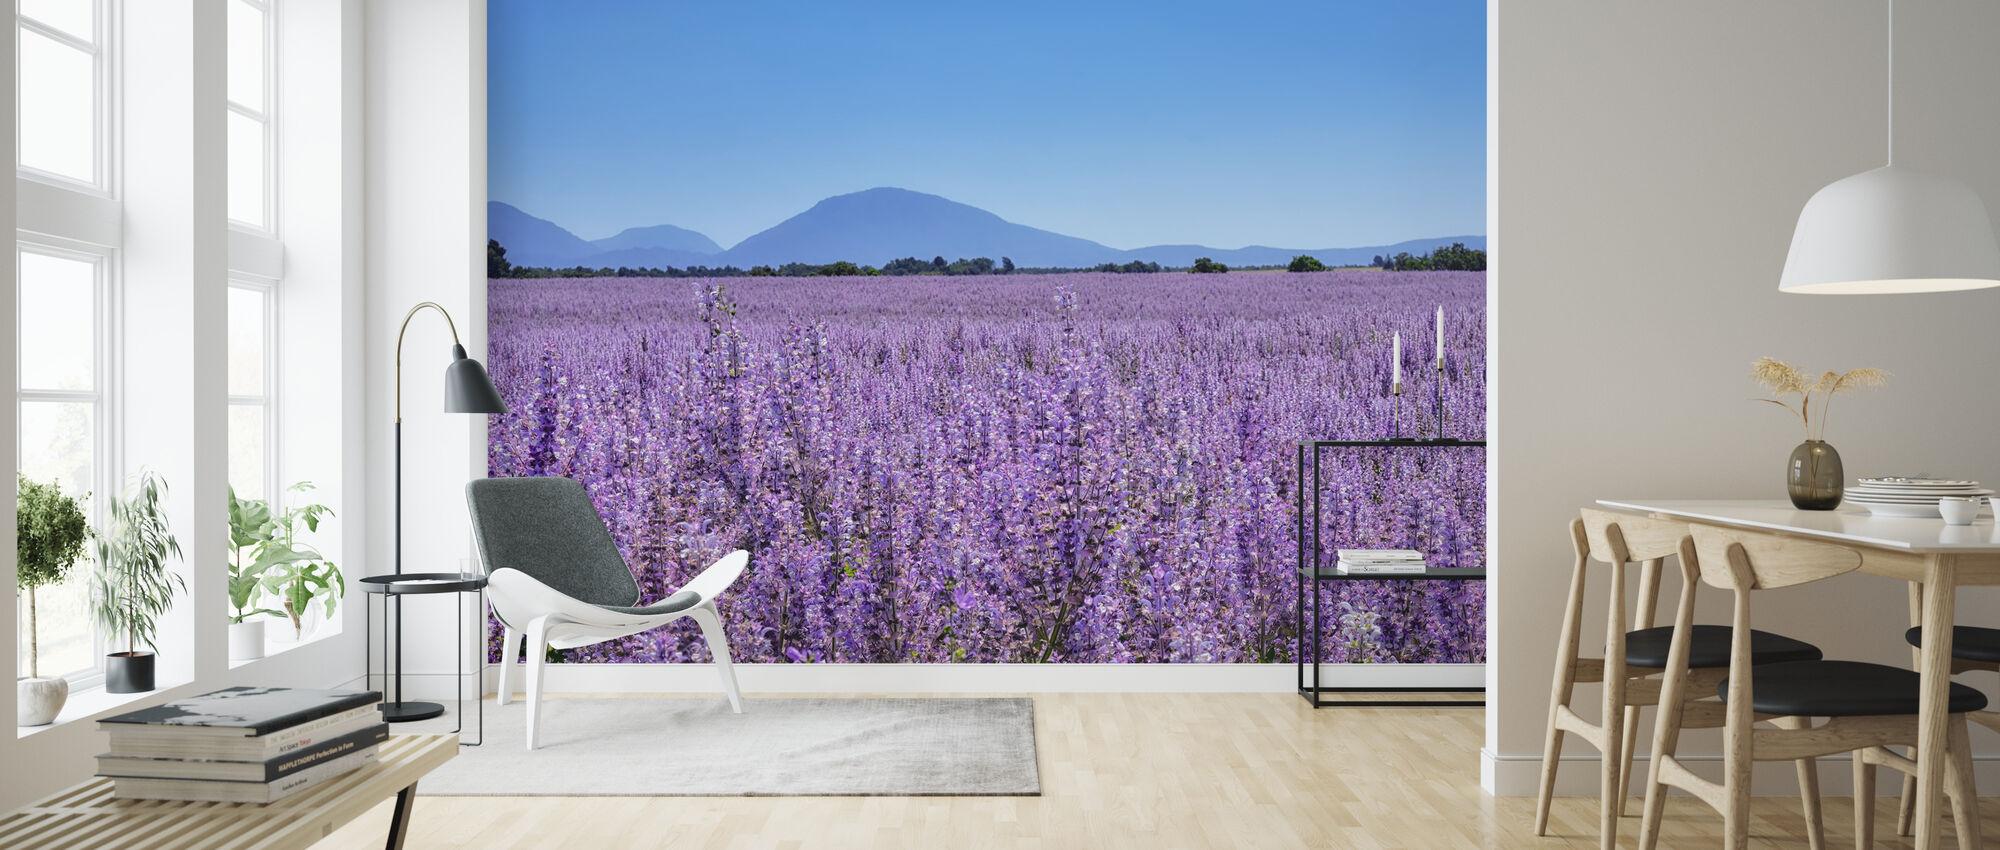 Clary Sage field - Wallpaper - Living Room